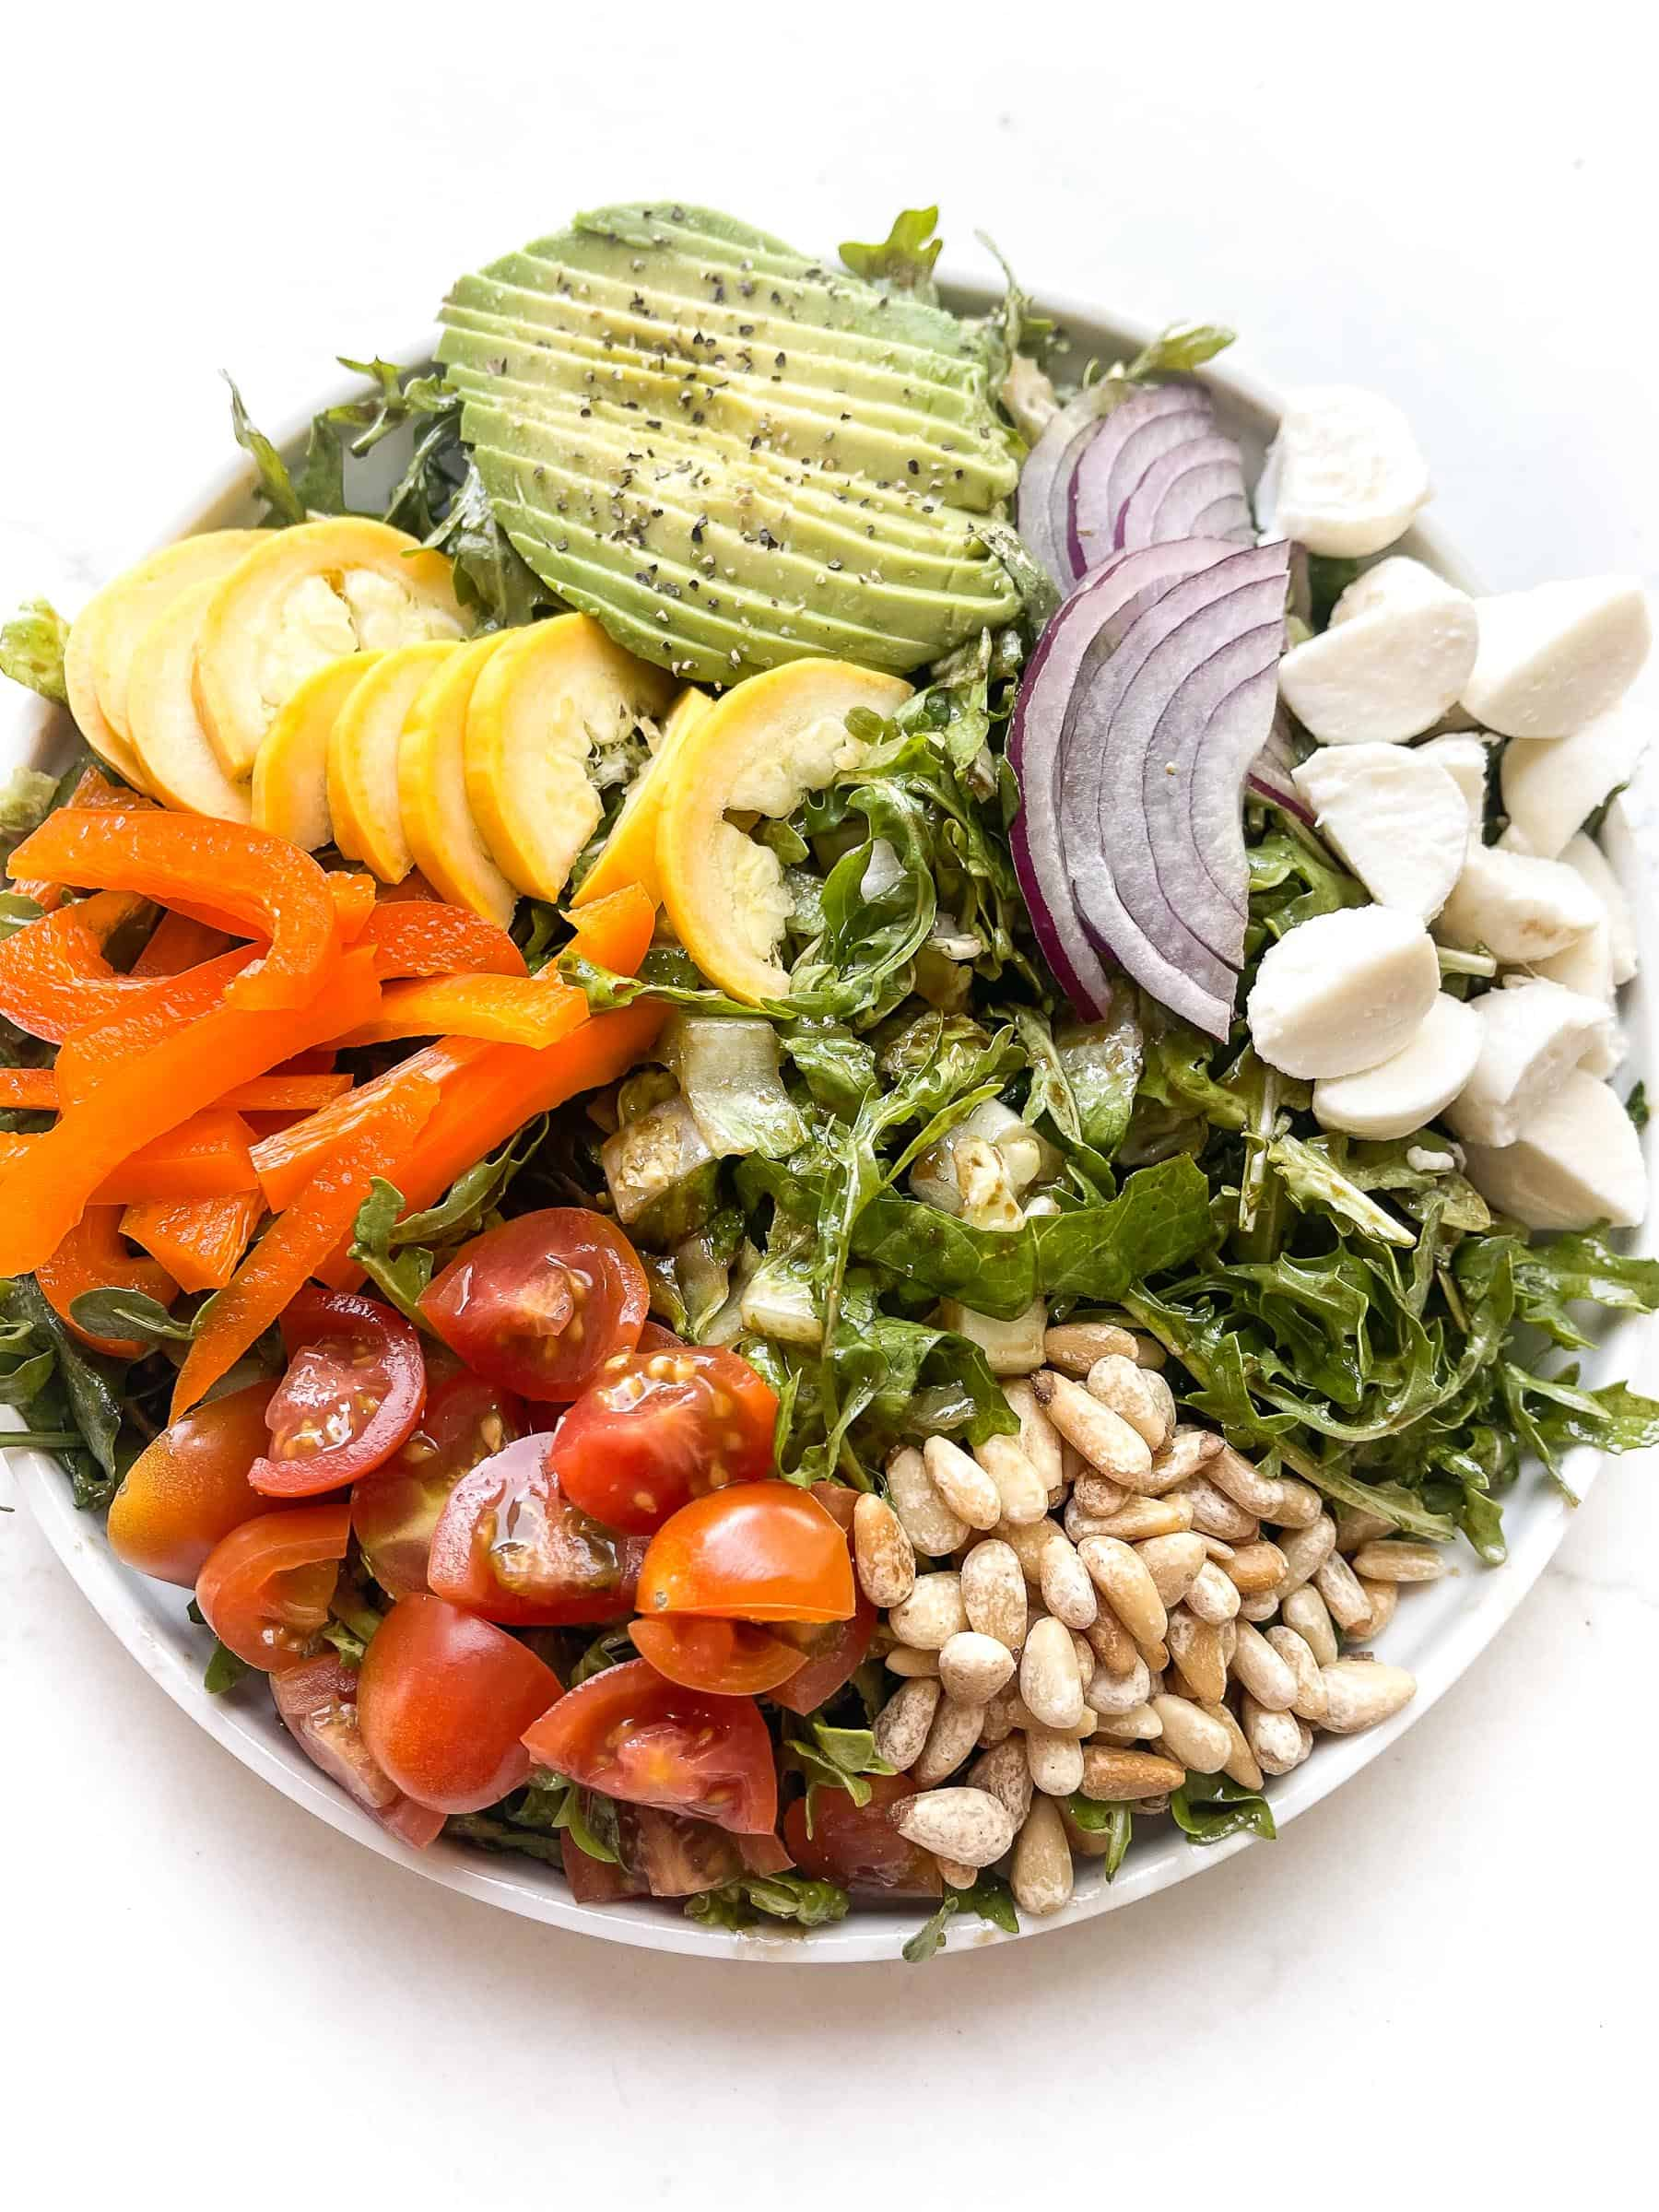 rainbow chopped salad with tomatoes, bell pepper, squash, avocado, red onion, mozzarella + pinenuts over arugula